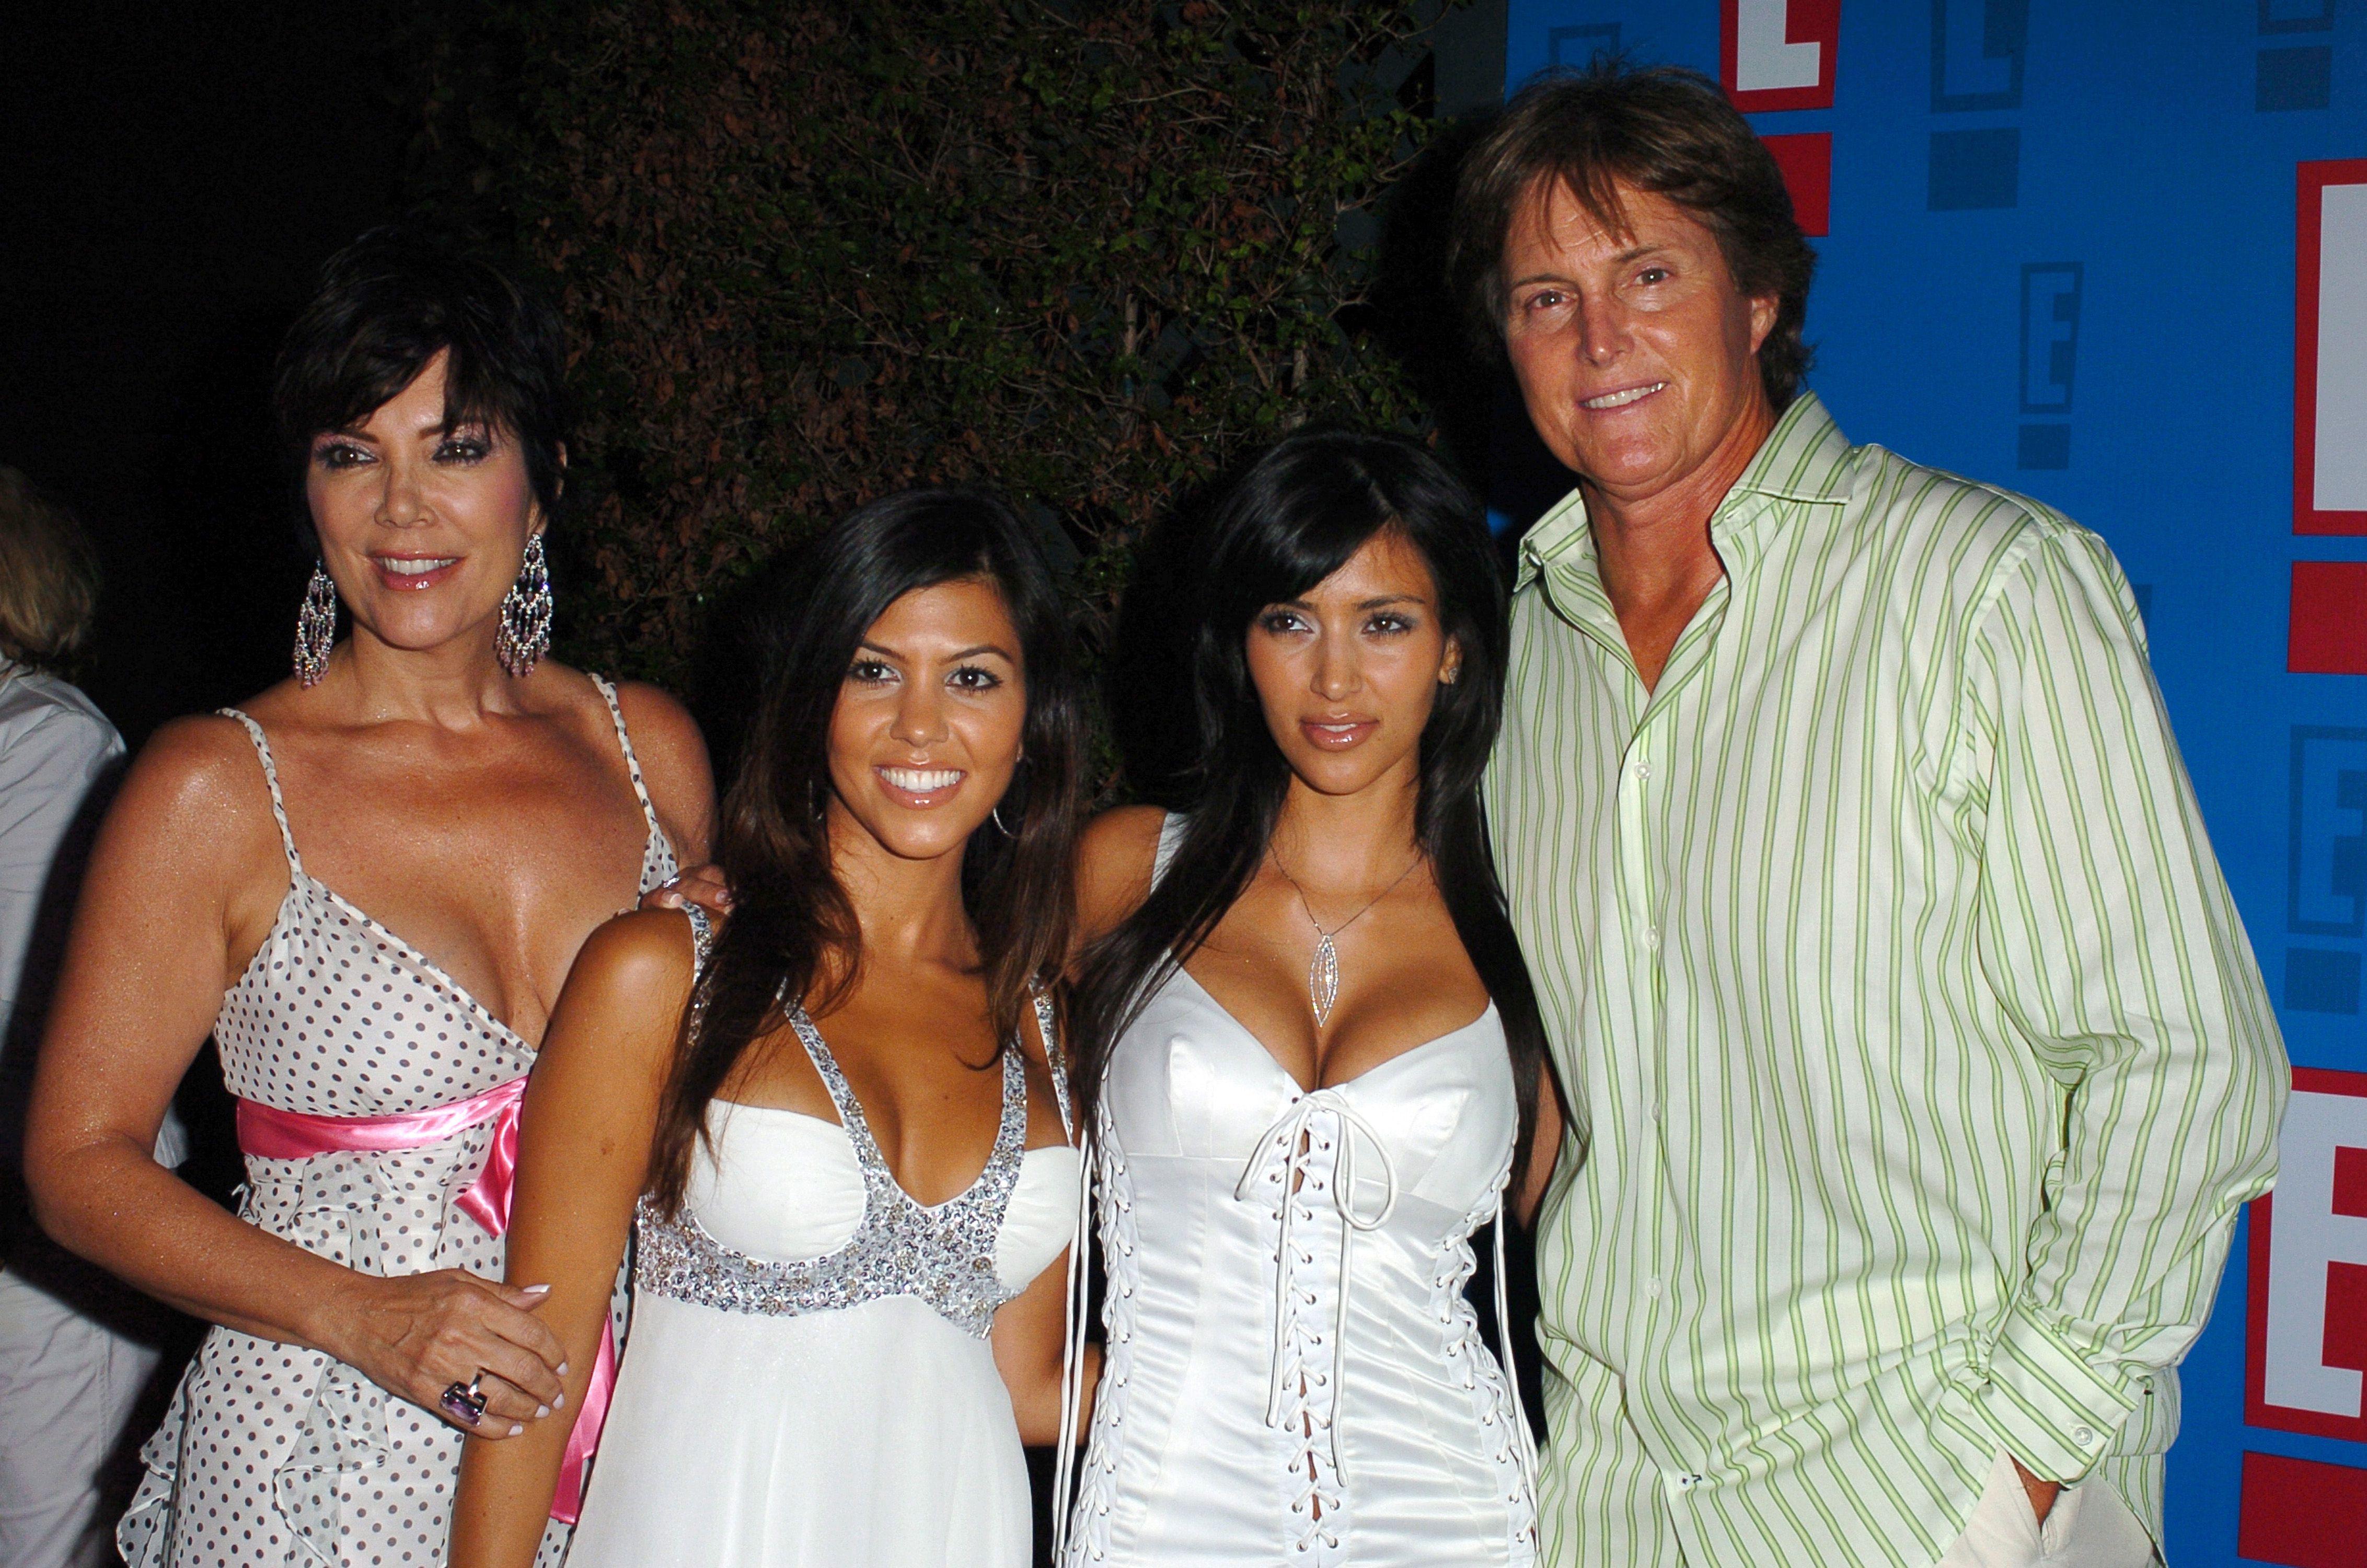 Bruce and the Kardashians